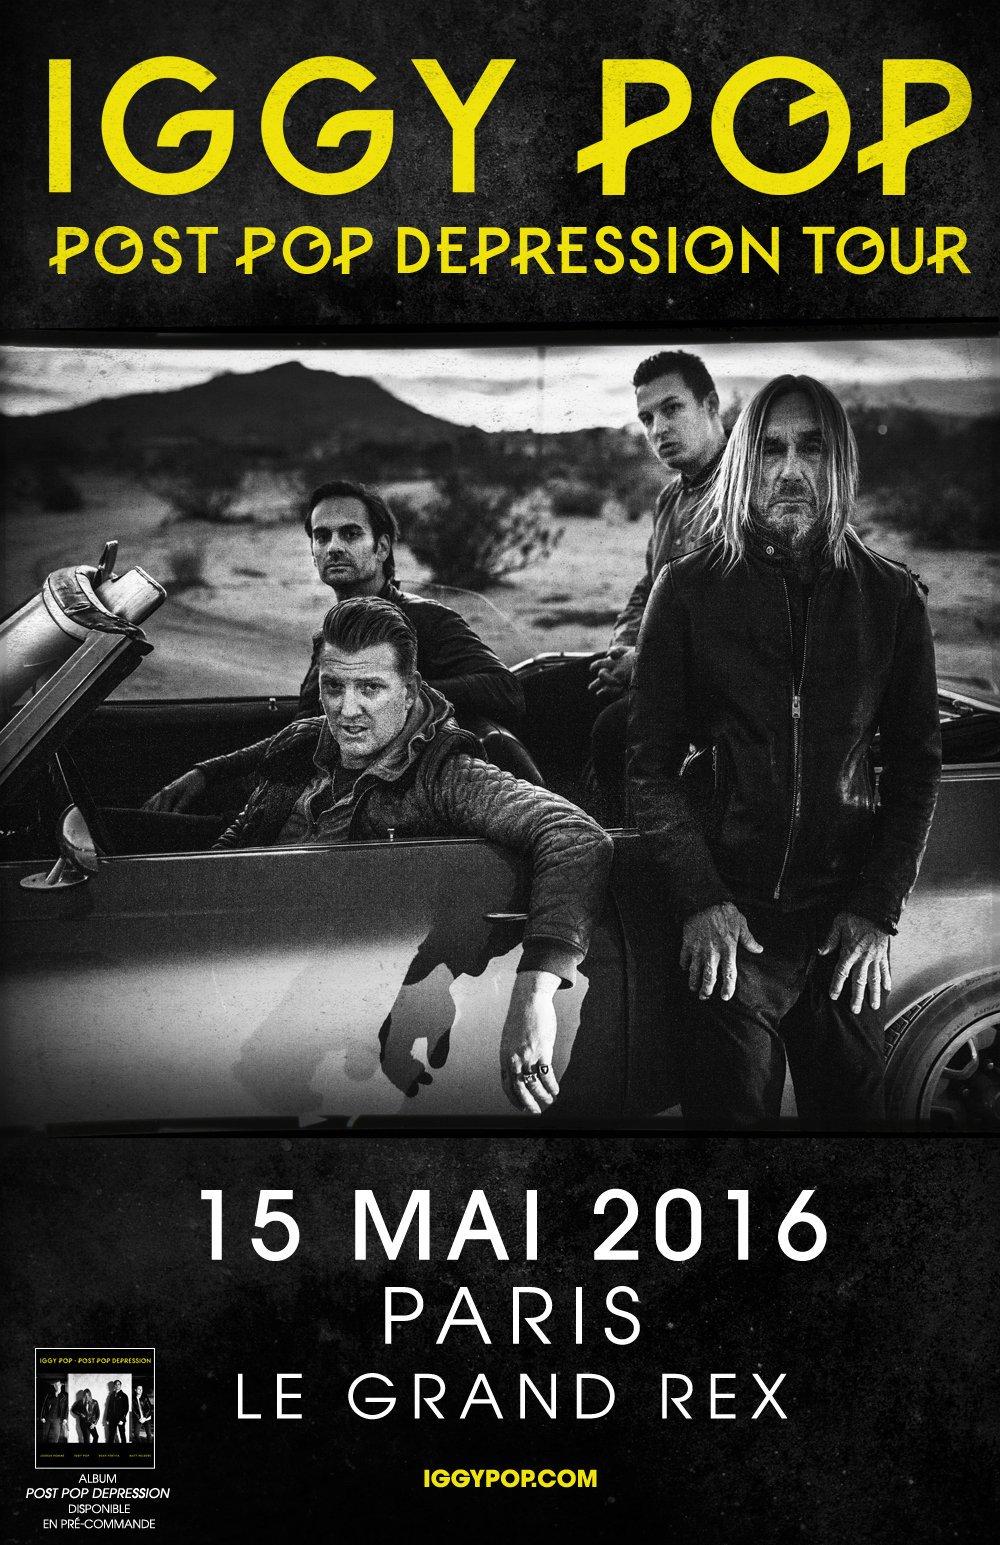 Iggy Pop Album Covers Ideal rockerparis: iggy pop @ grand rex, paris, 15 mai 2016